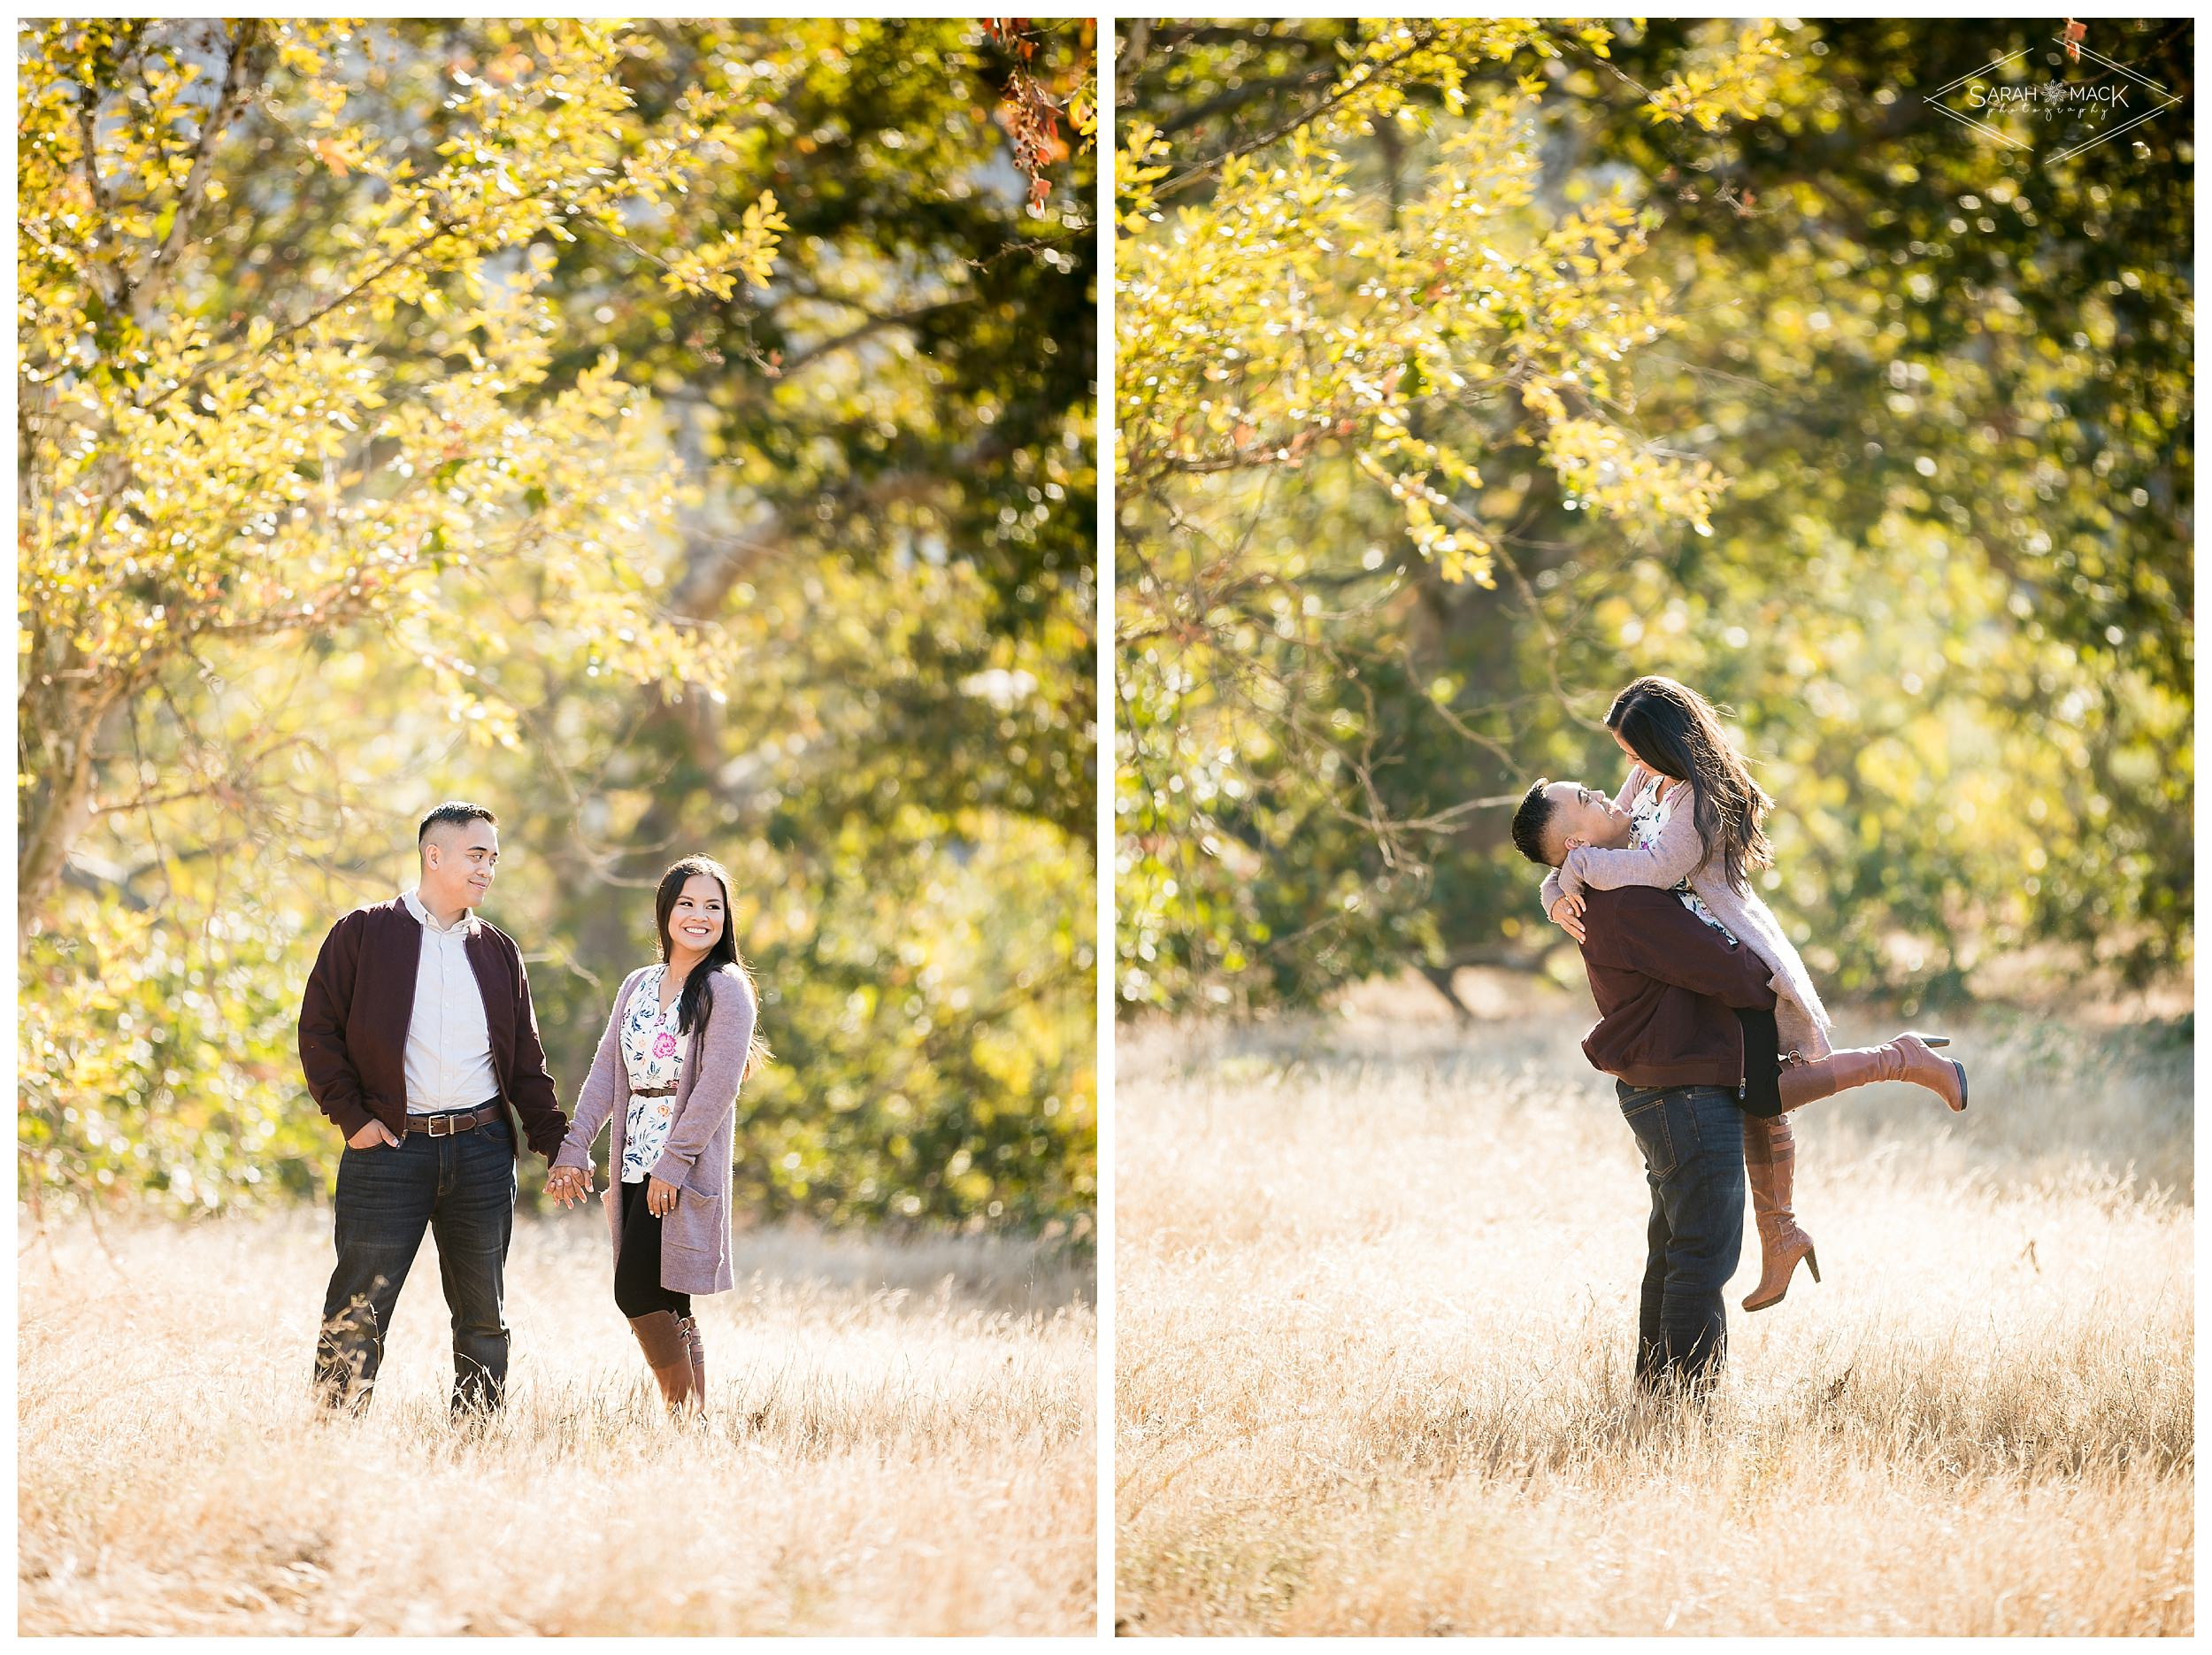 LE_Orange-County-Engagement-Photography 21.jpg